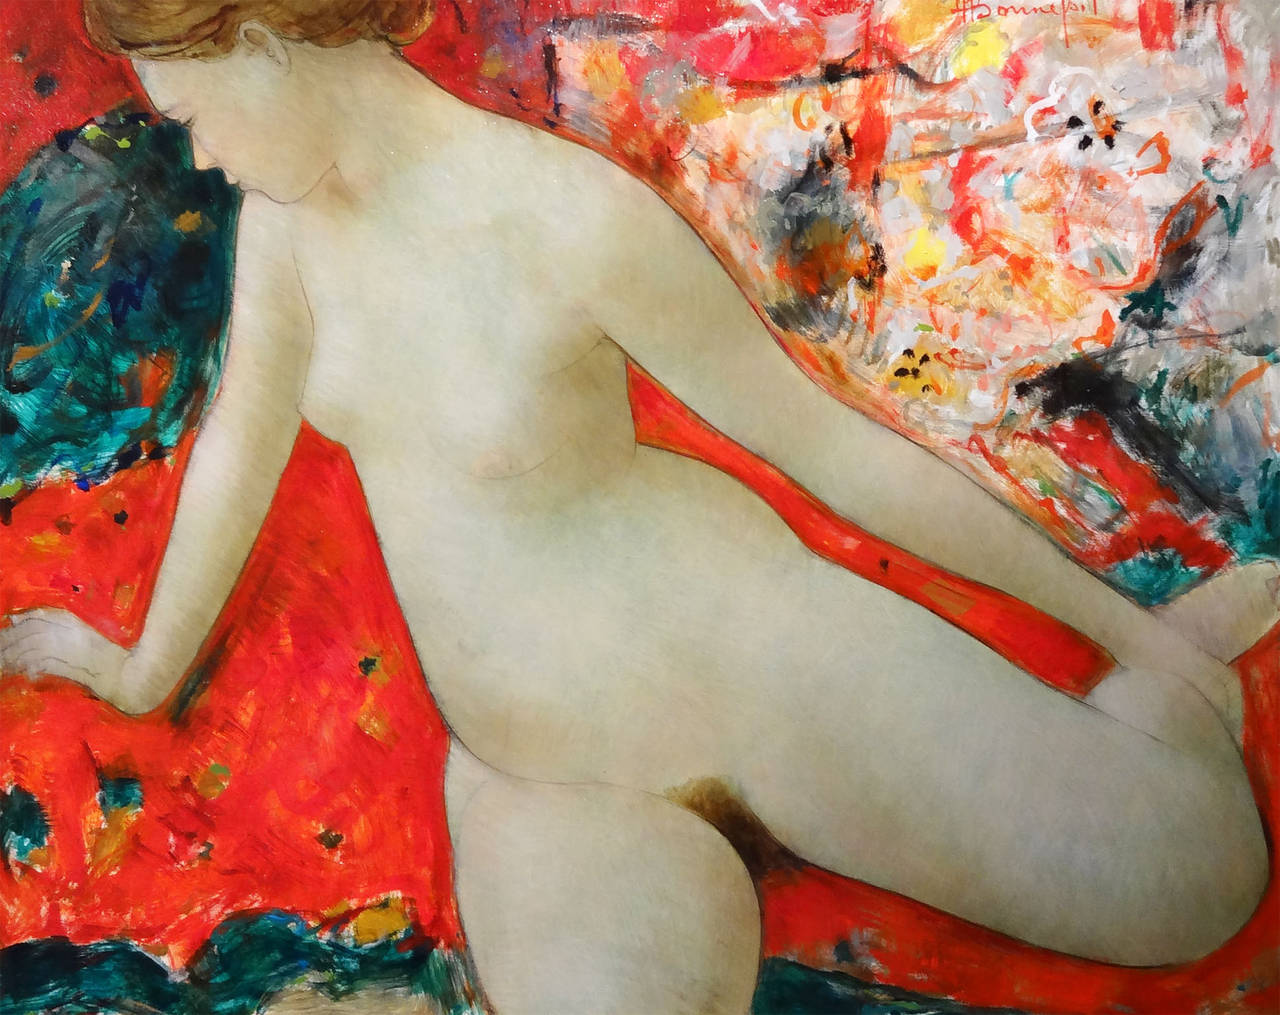 Alain Bonnefoit Nude Painting - Primavera